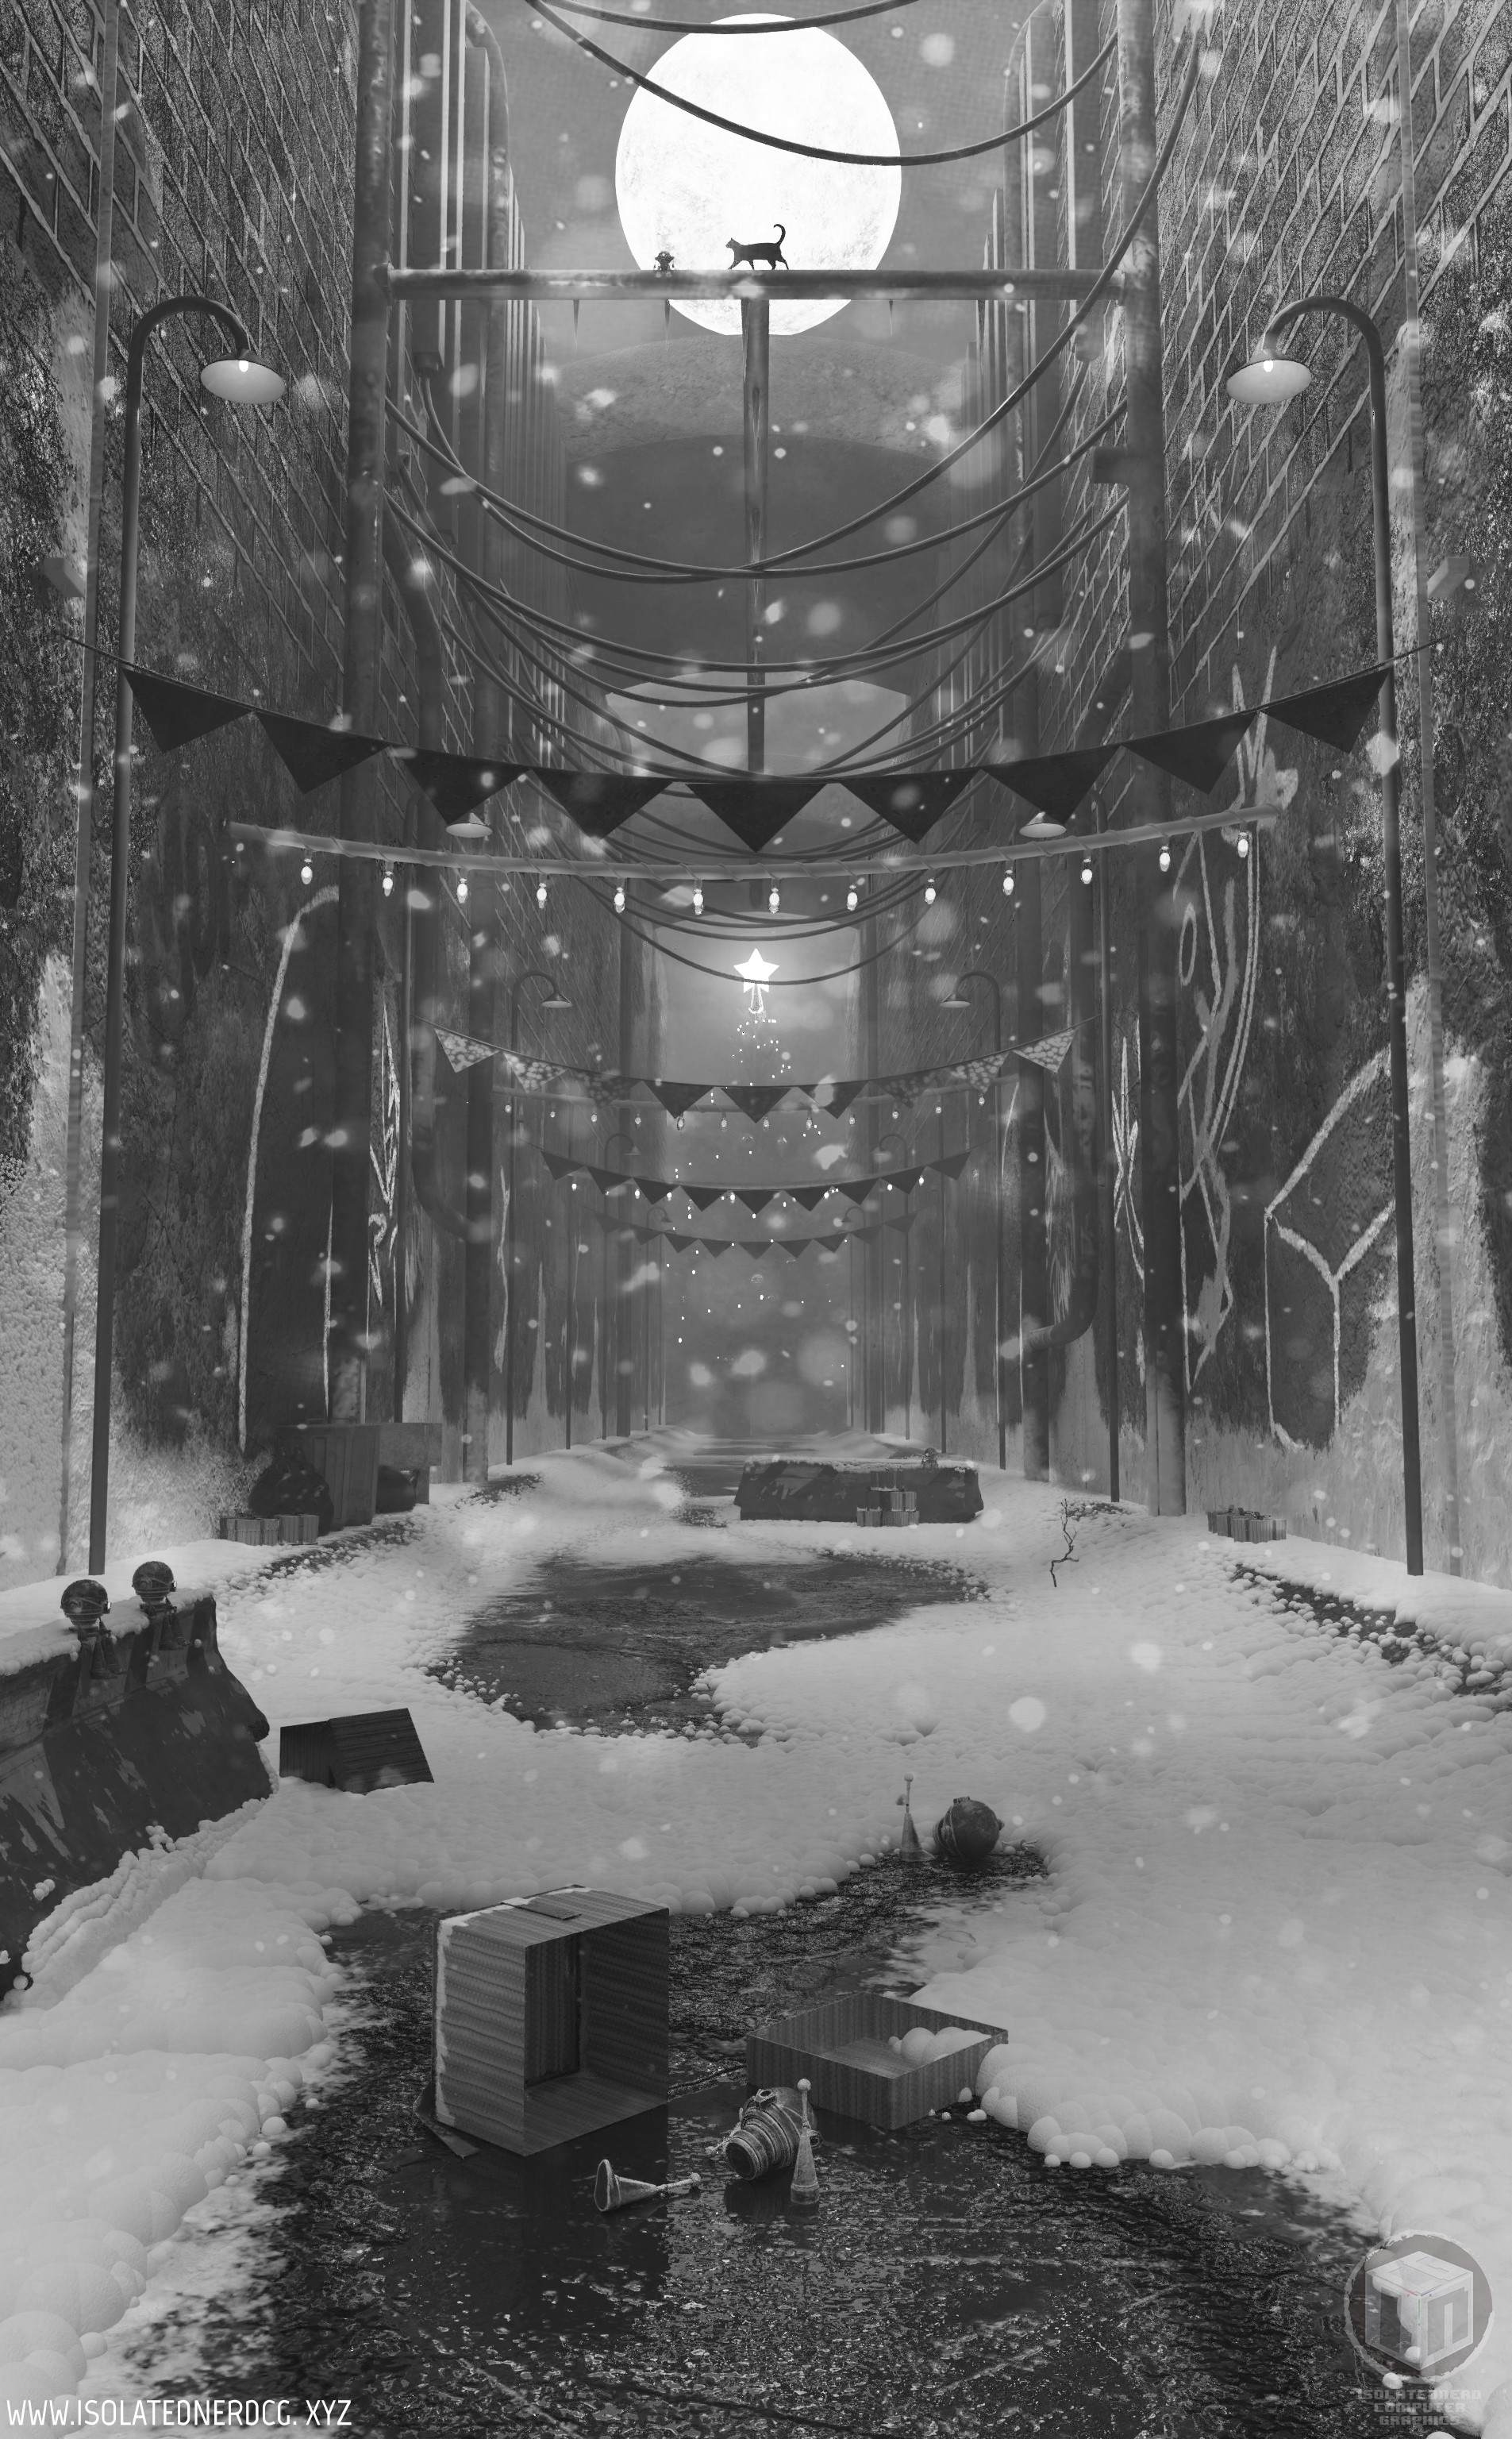 Matias toloza isolatednerdcg snow finalpngbw